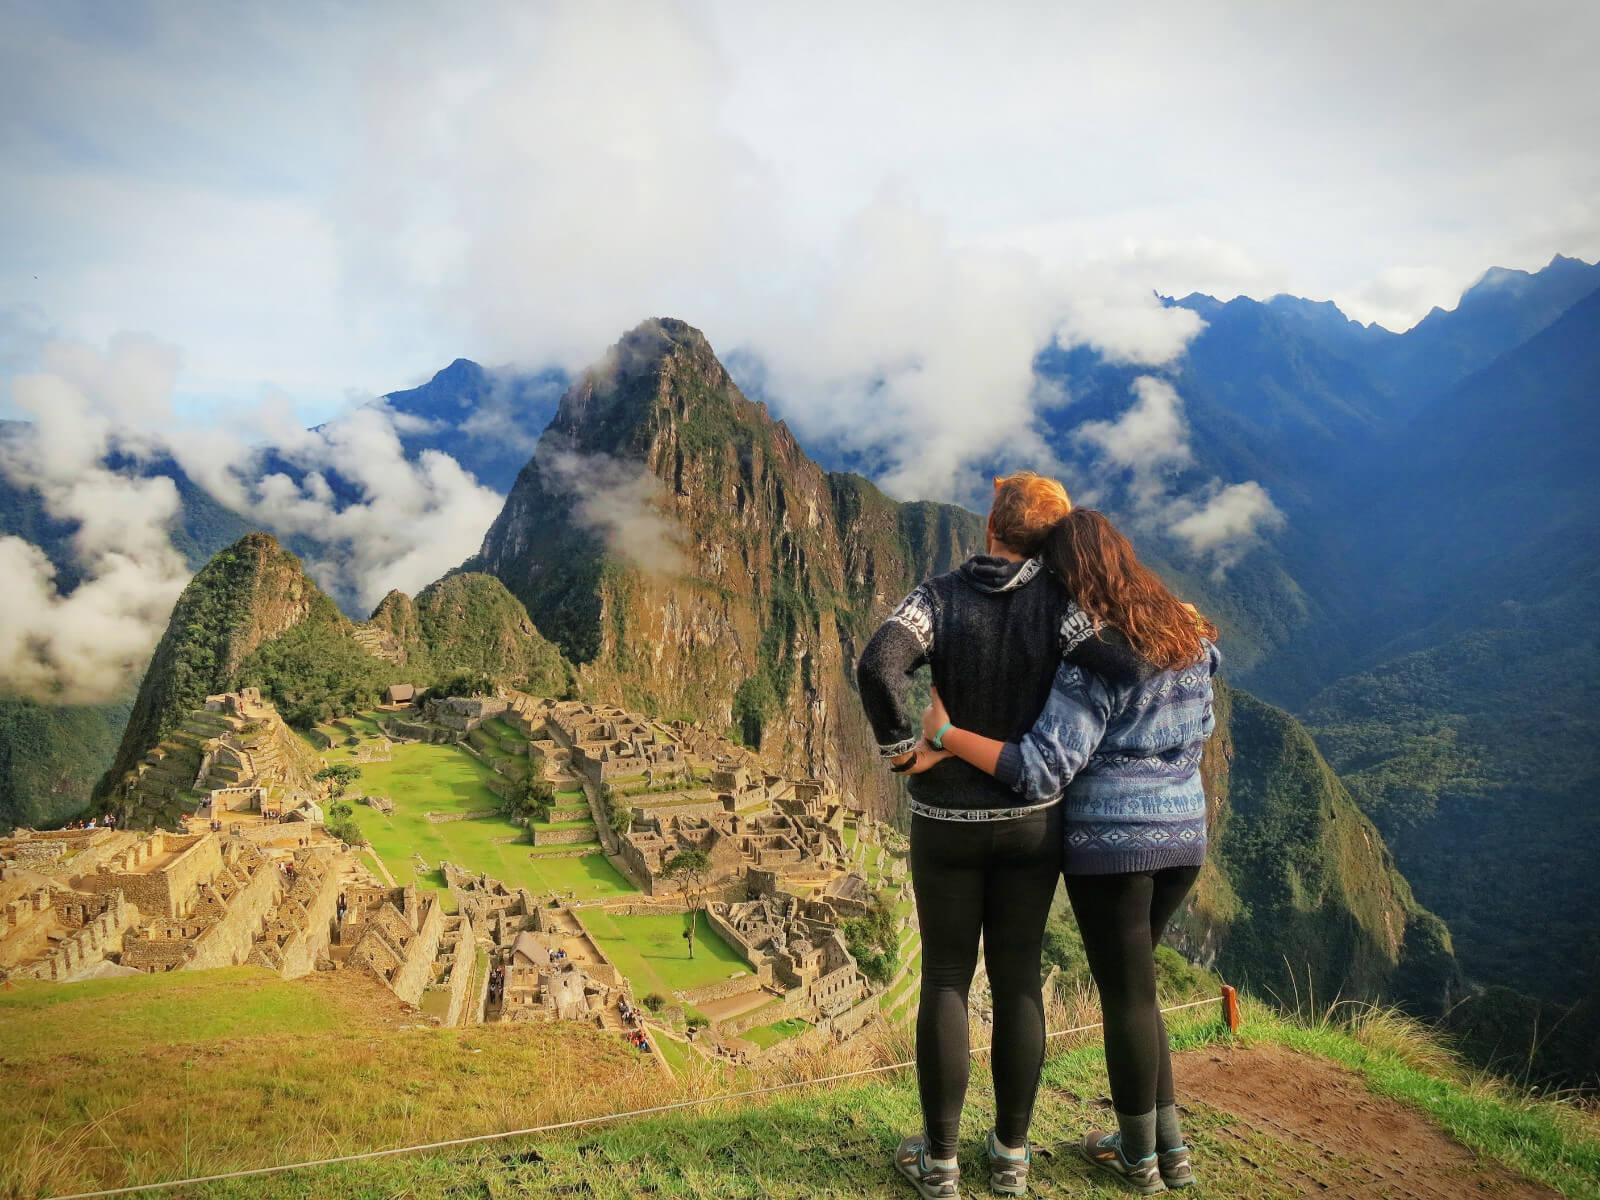 Couple overlooking Machu Picchu, Peru